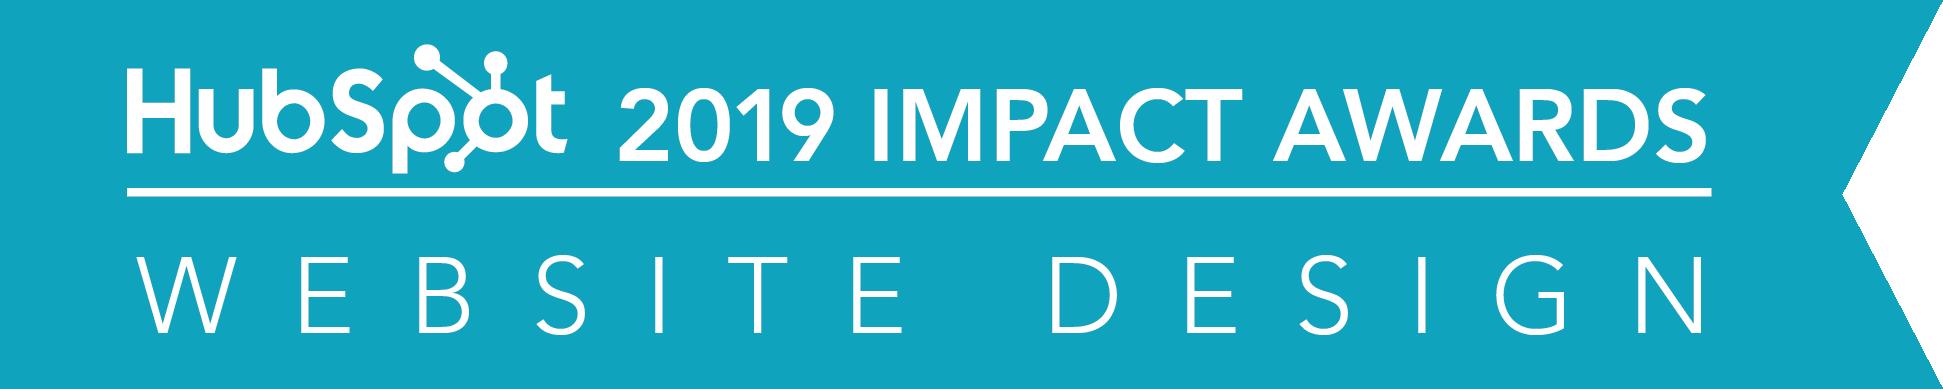 Hubspot_ImpactAwards_2019_WebsiteDesign-02